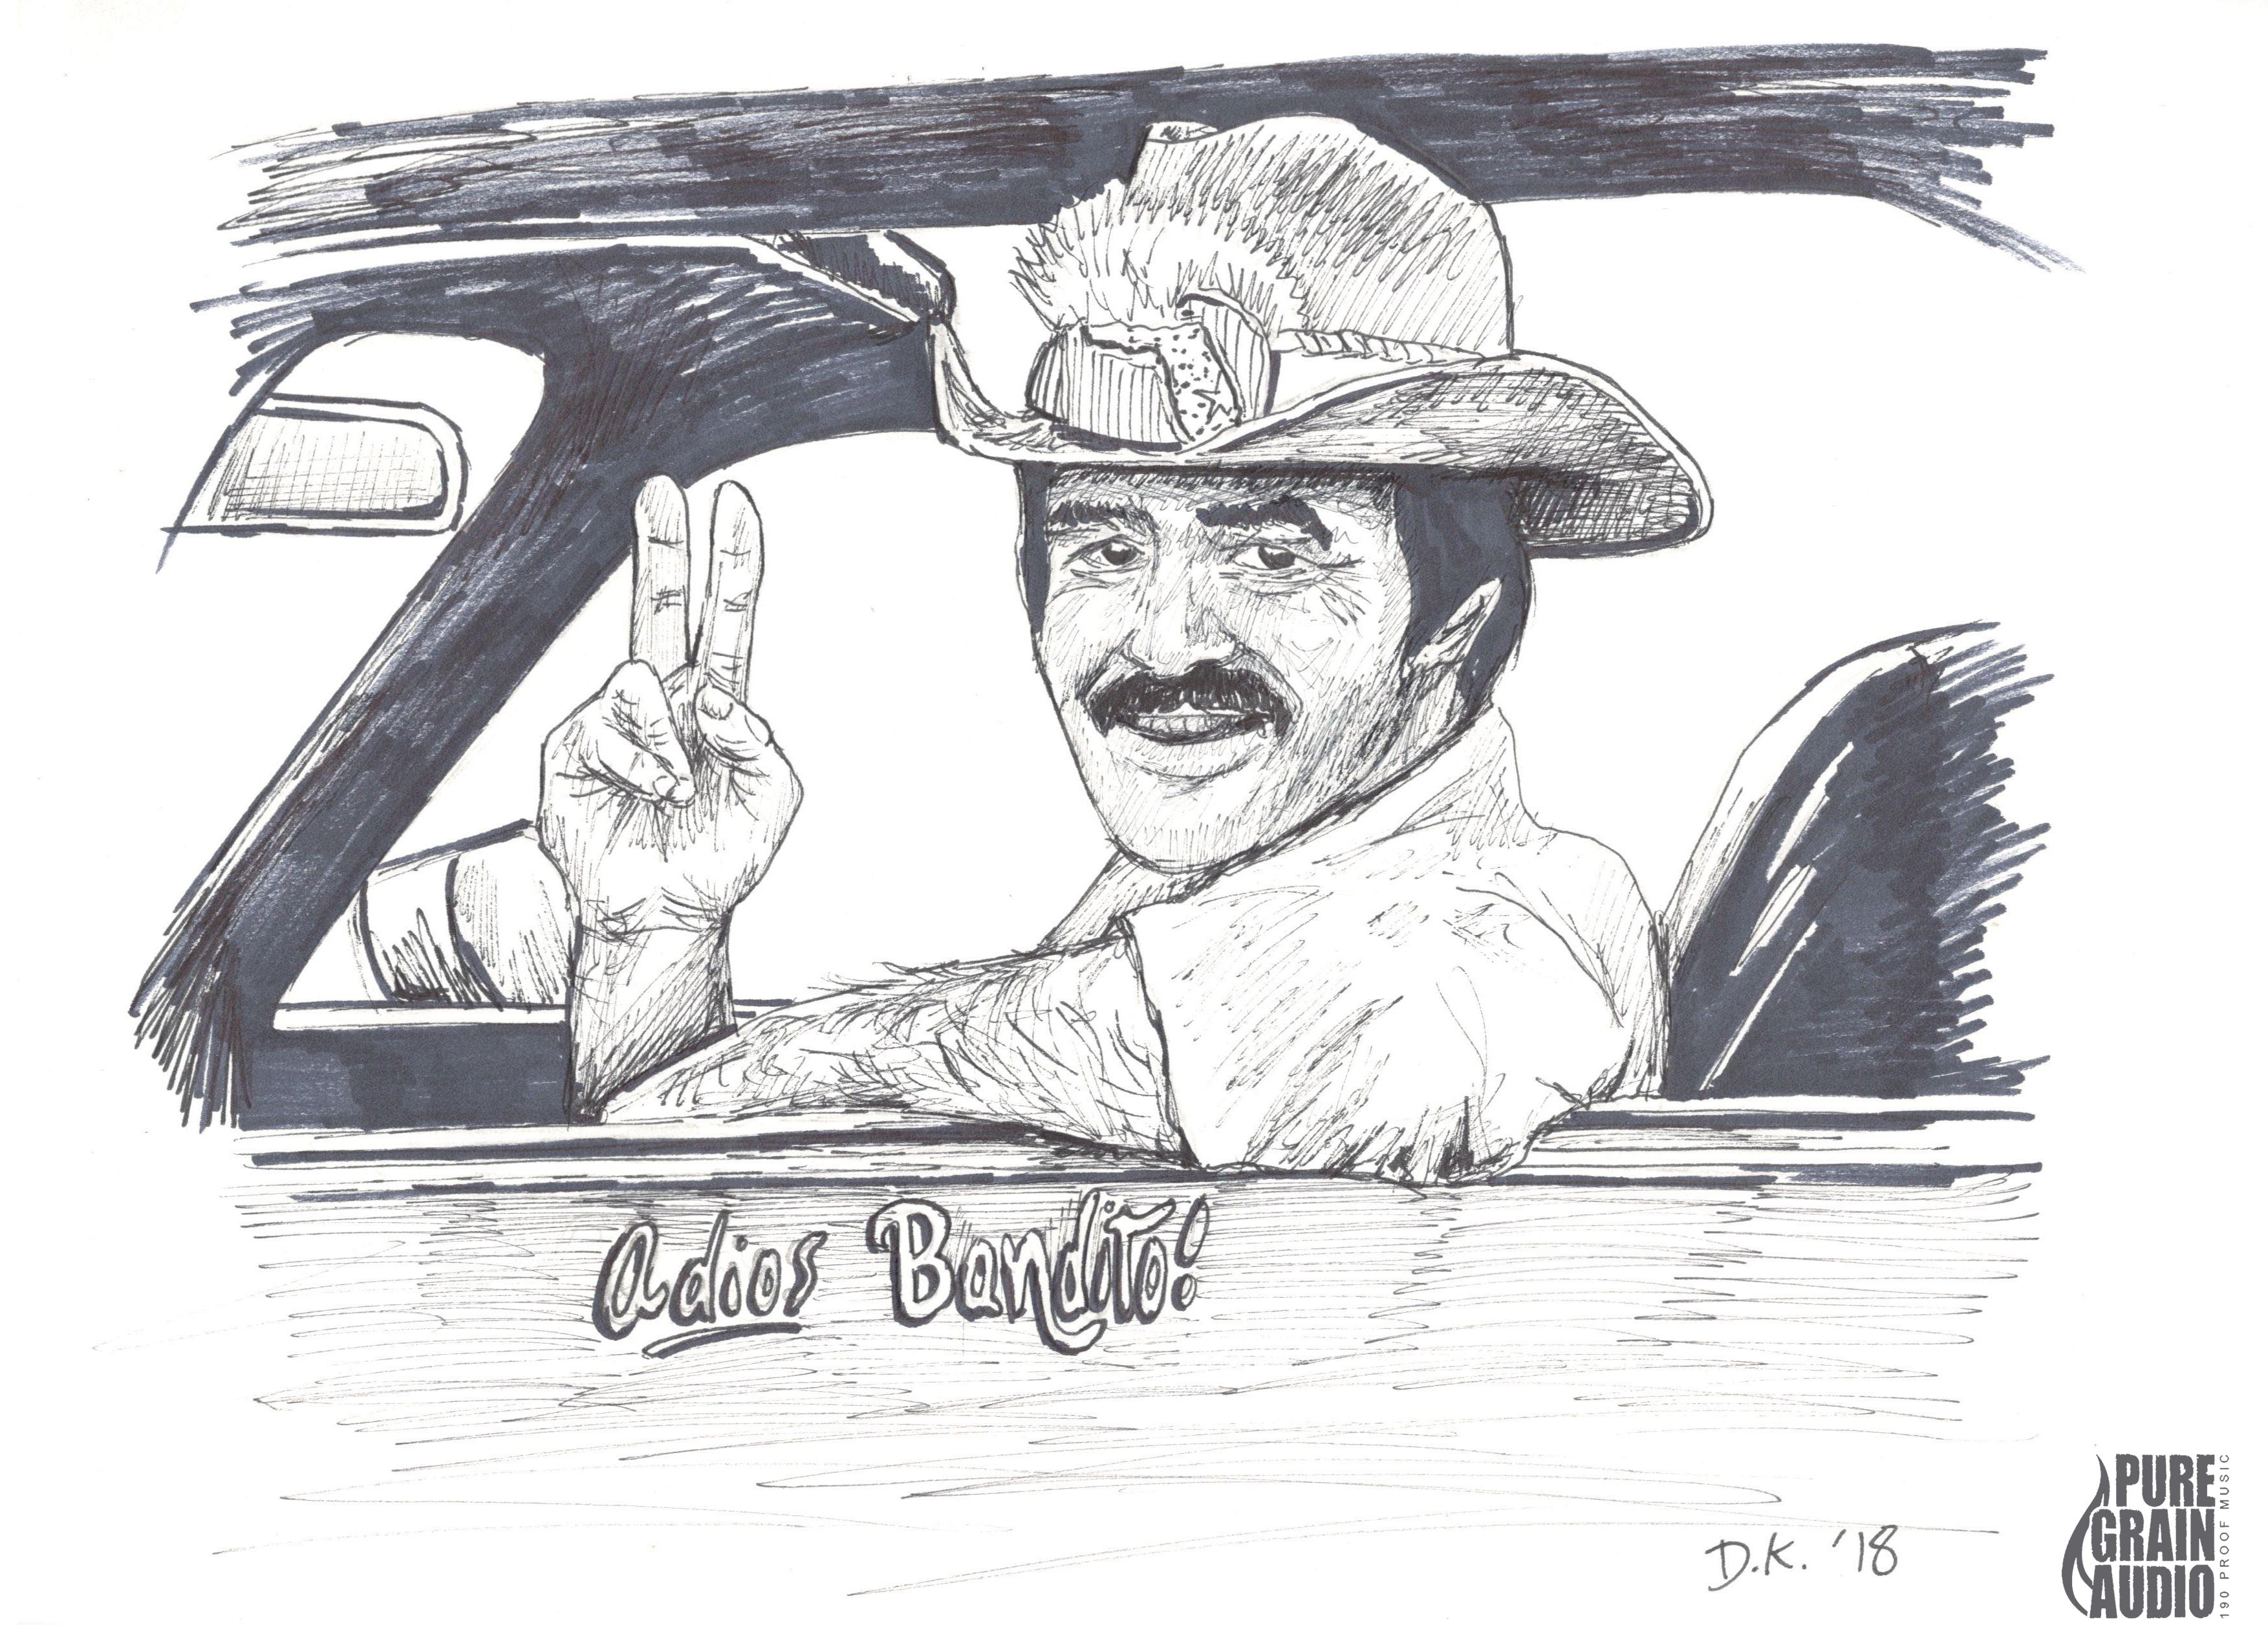 PENsive #11- Adios Bandito- featuring Burt Reynolds- HIGH RES